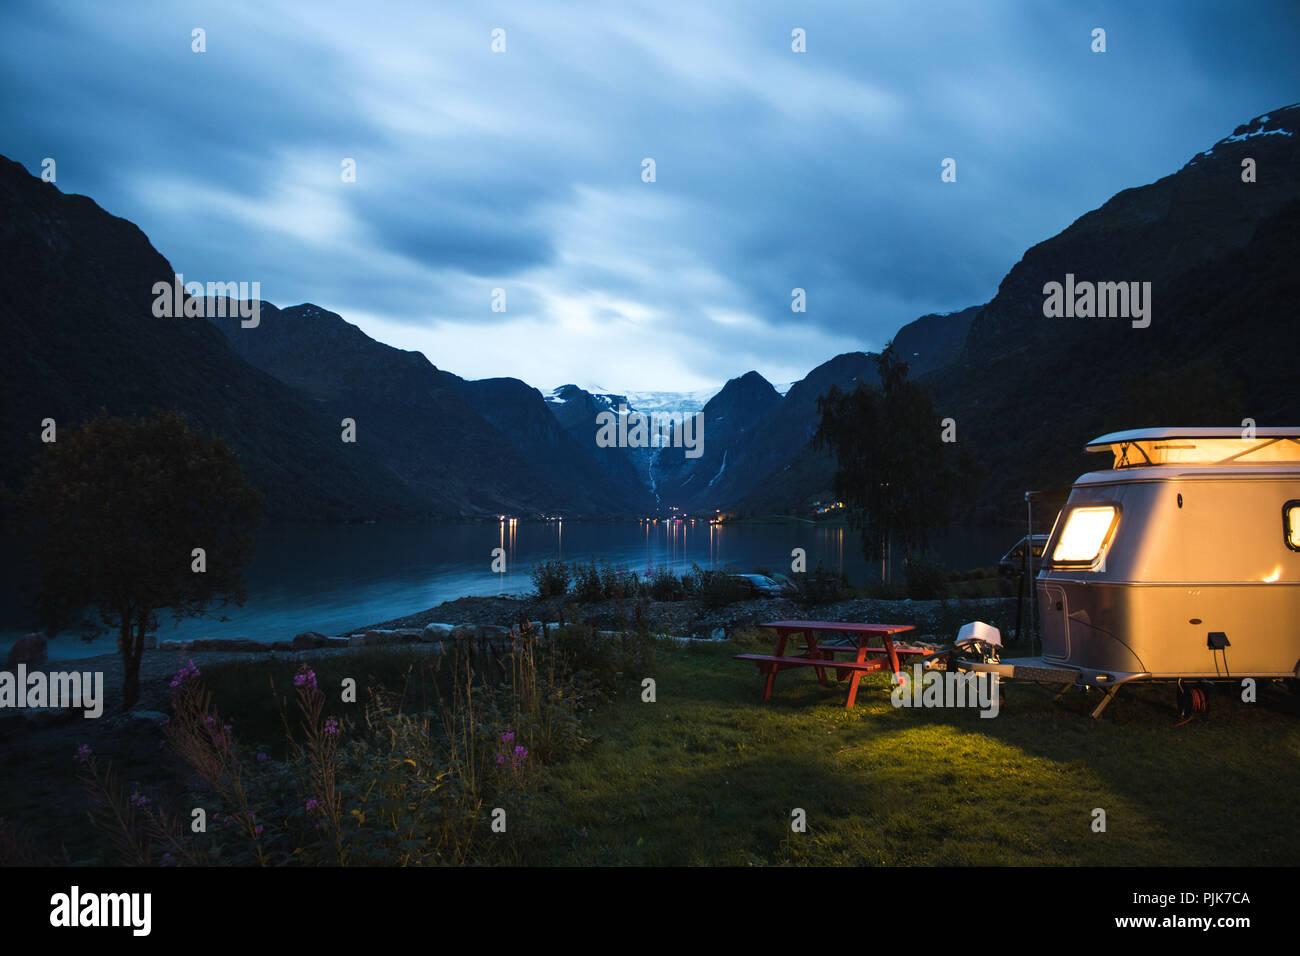 Norway, Stryn, Jostedalsbreen Glacier, Briksdalsbreen, Campsite by night - Stock Image